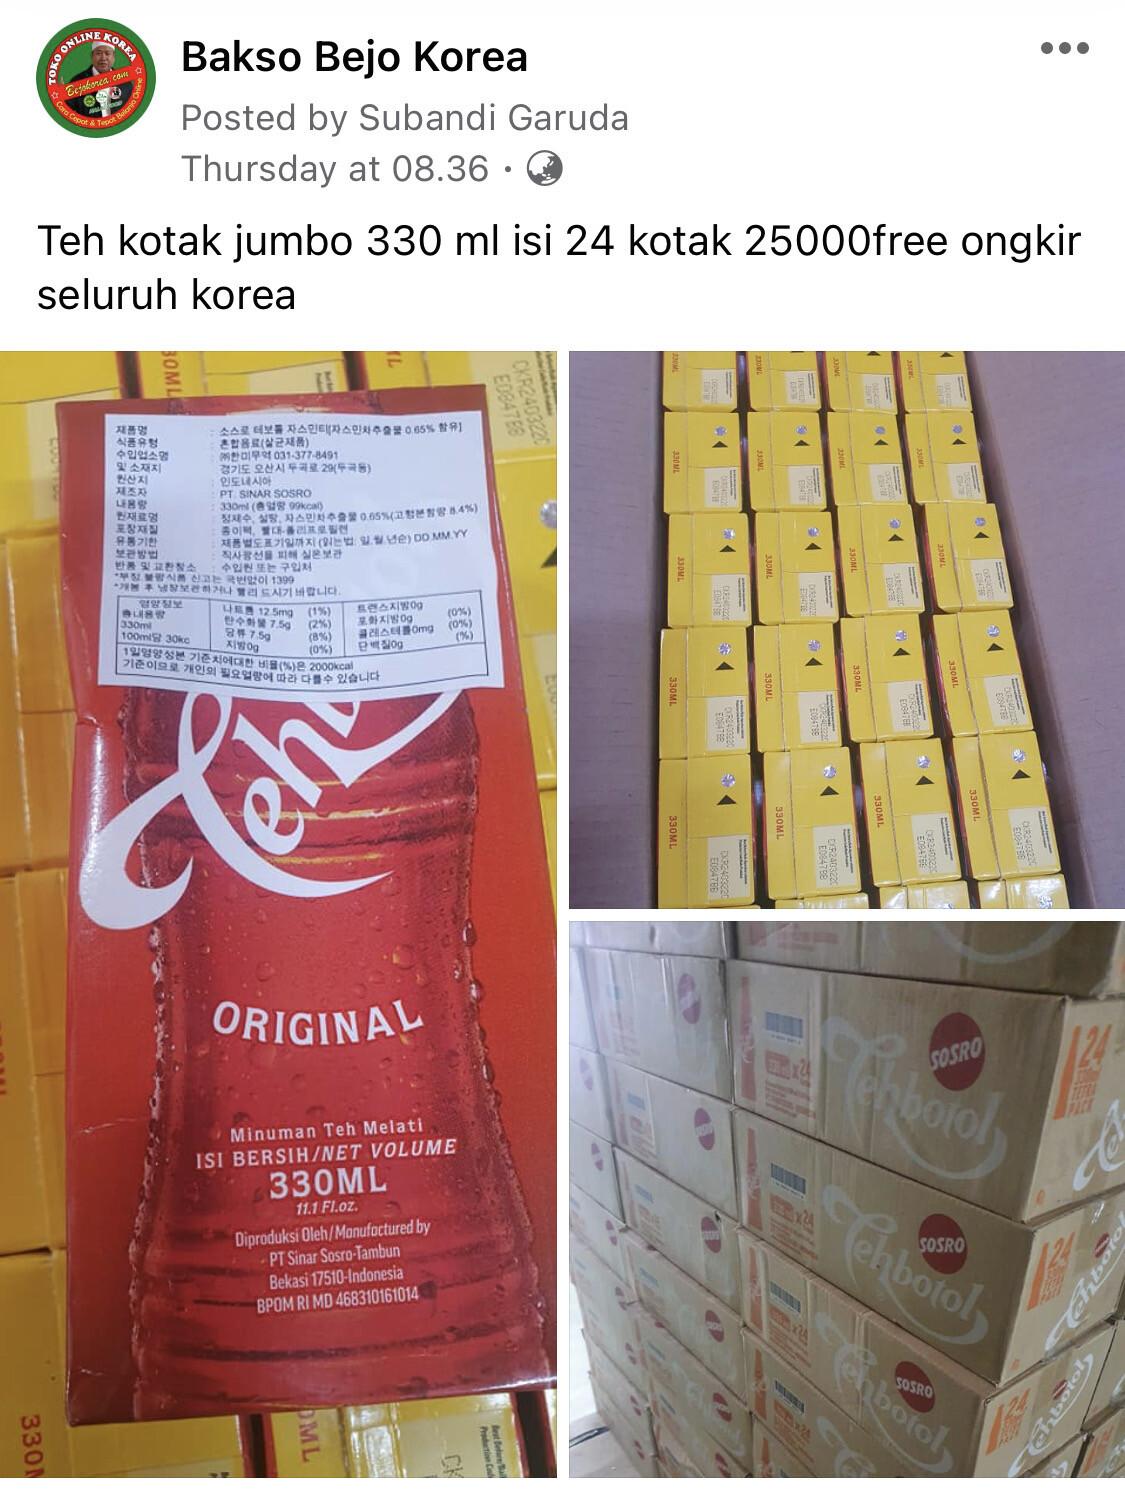 Promo Teh Botol Kotak 330 ml (per Kardus 24 Kotak) Free Ongkir